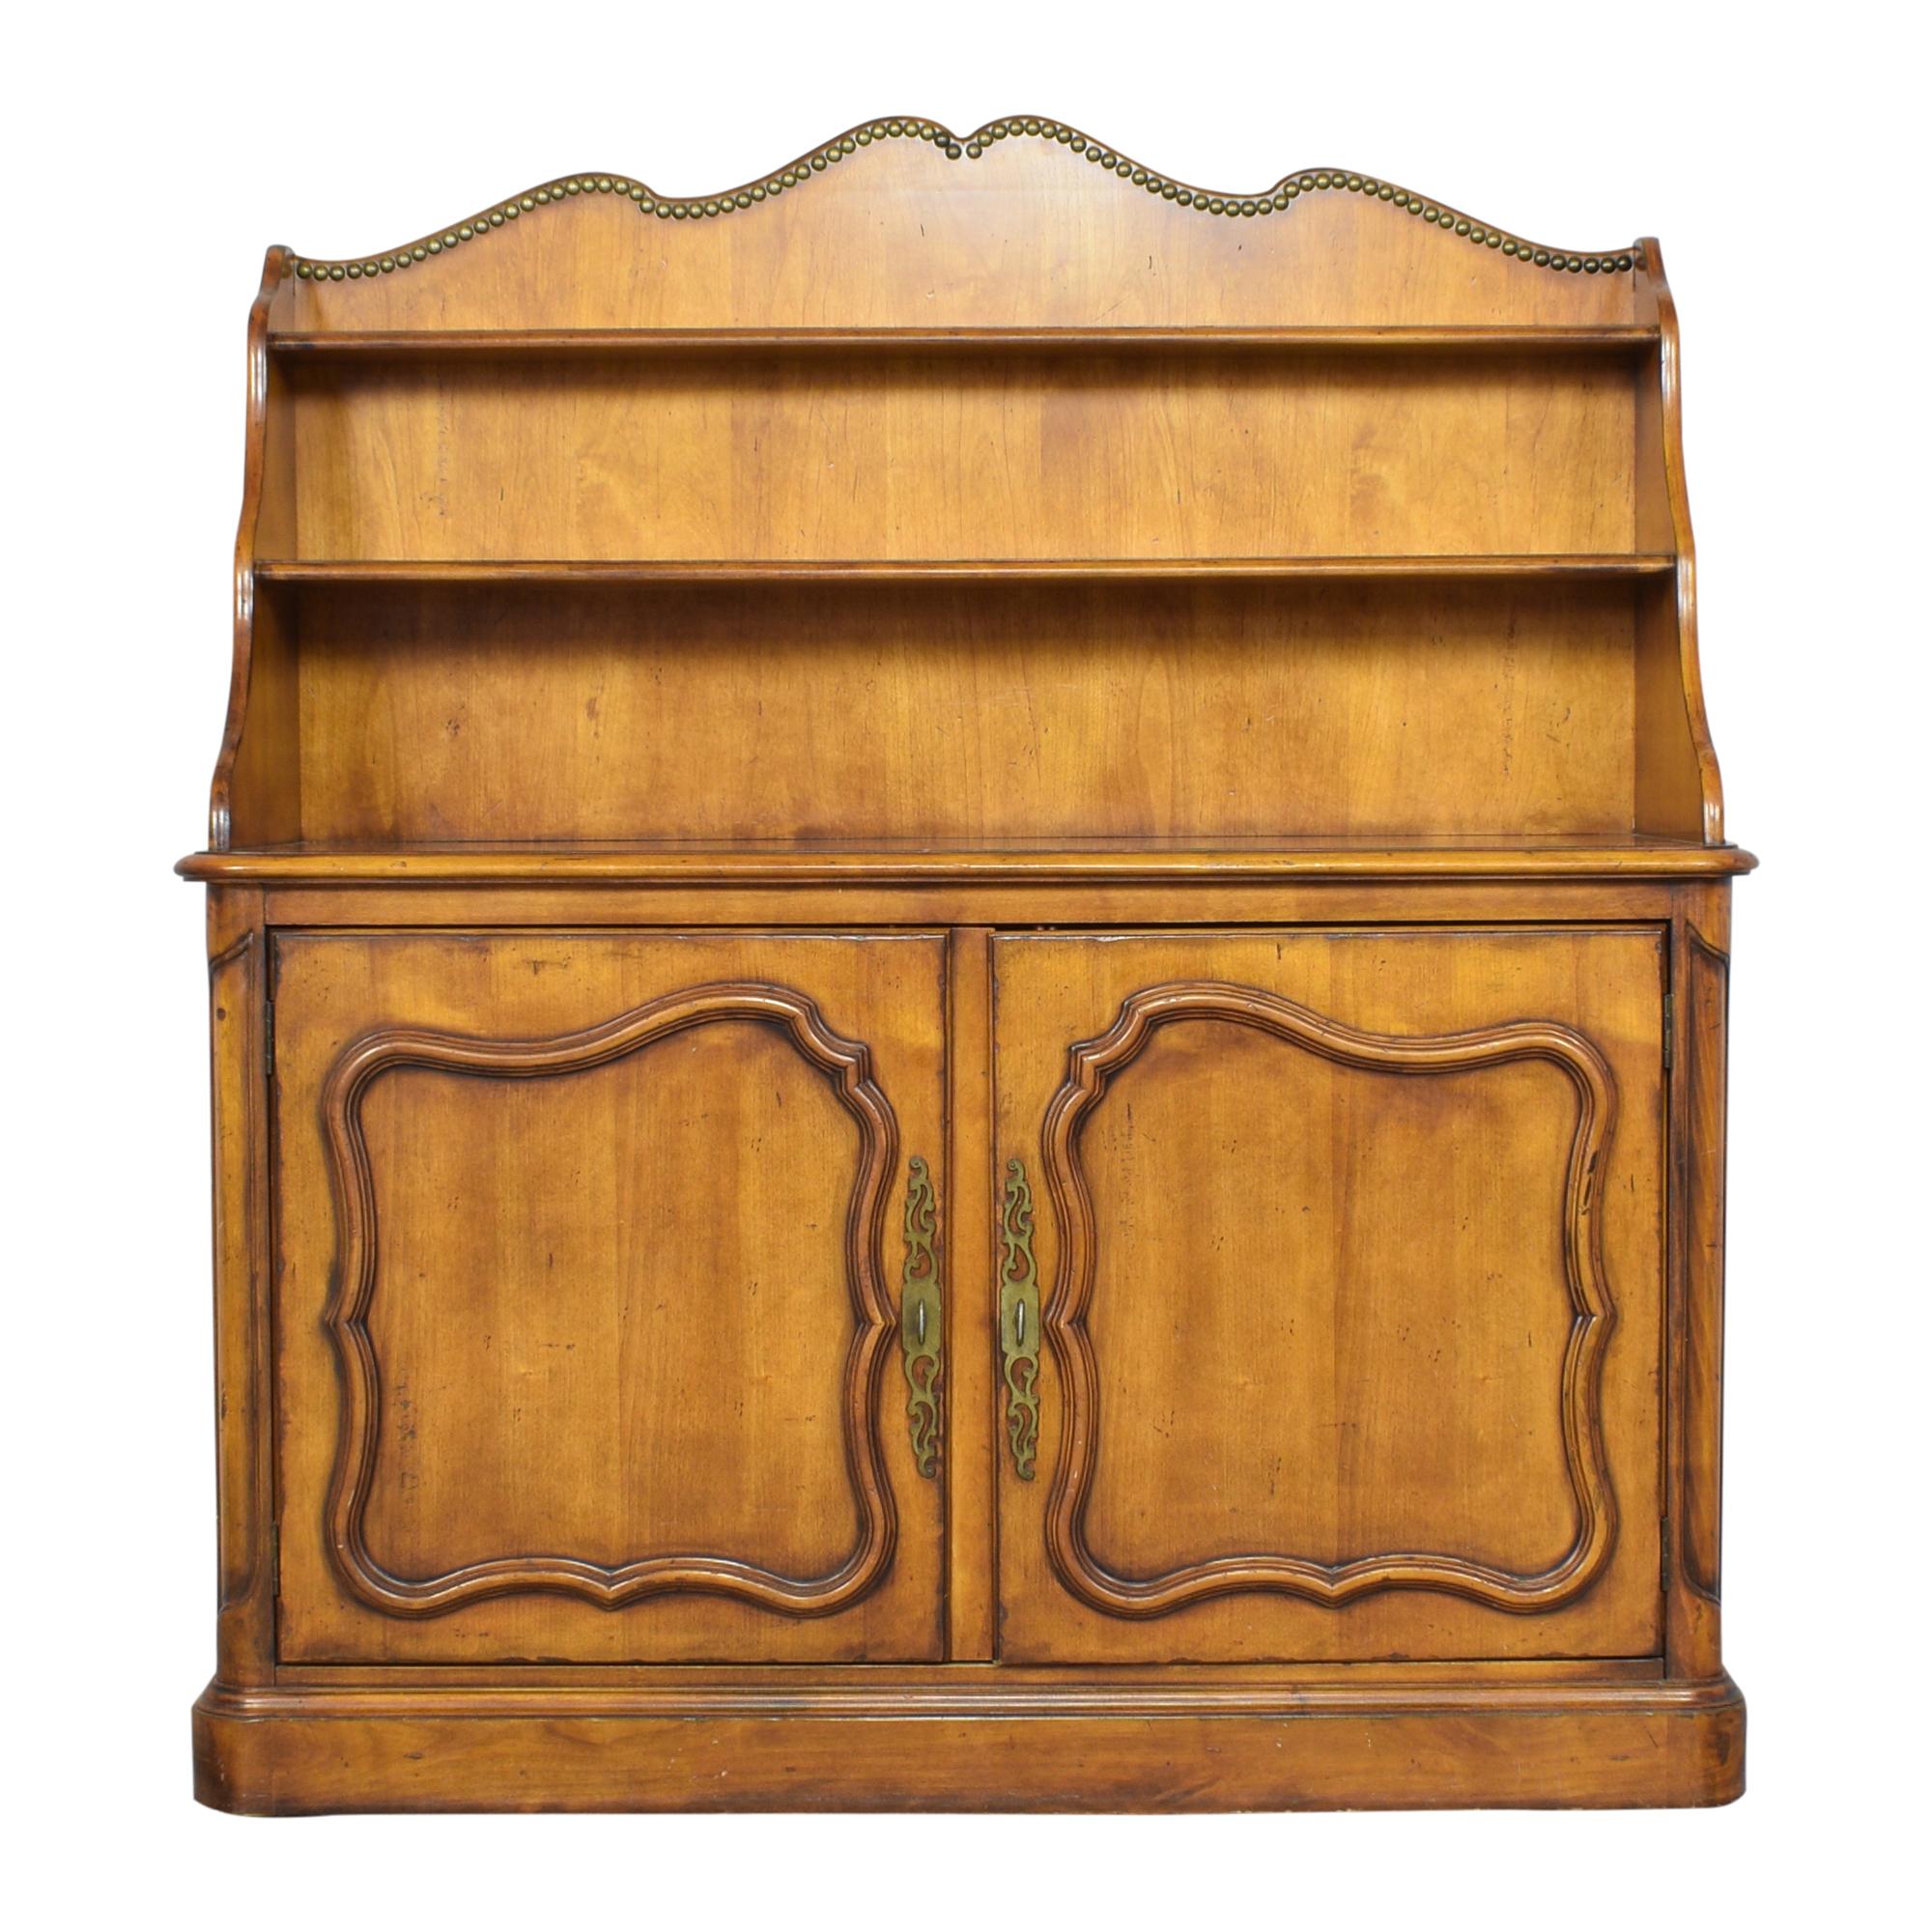 shop Bloomingdale's Buffet Server Bloomingdale's Cabinets & Sideboards